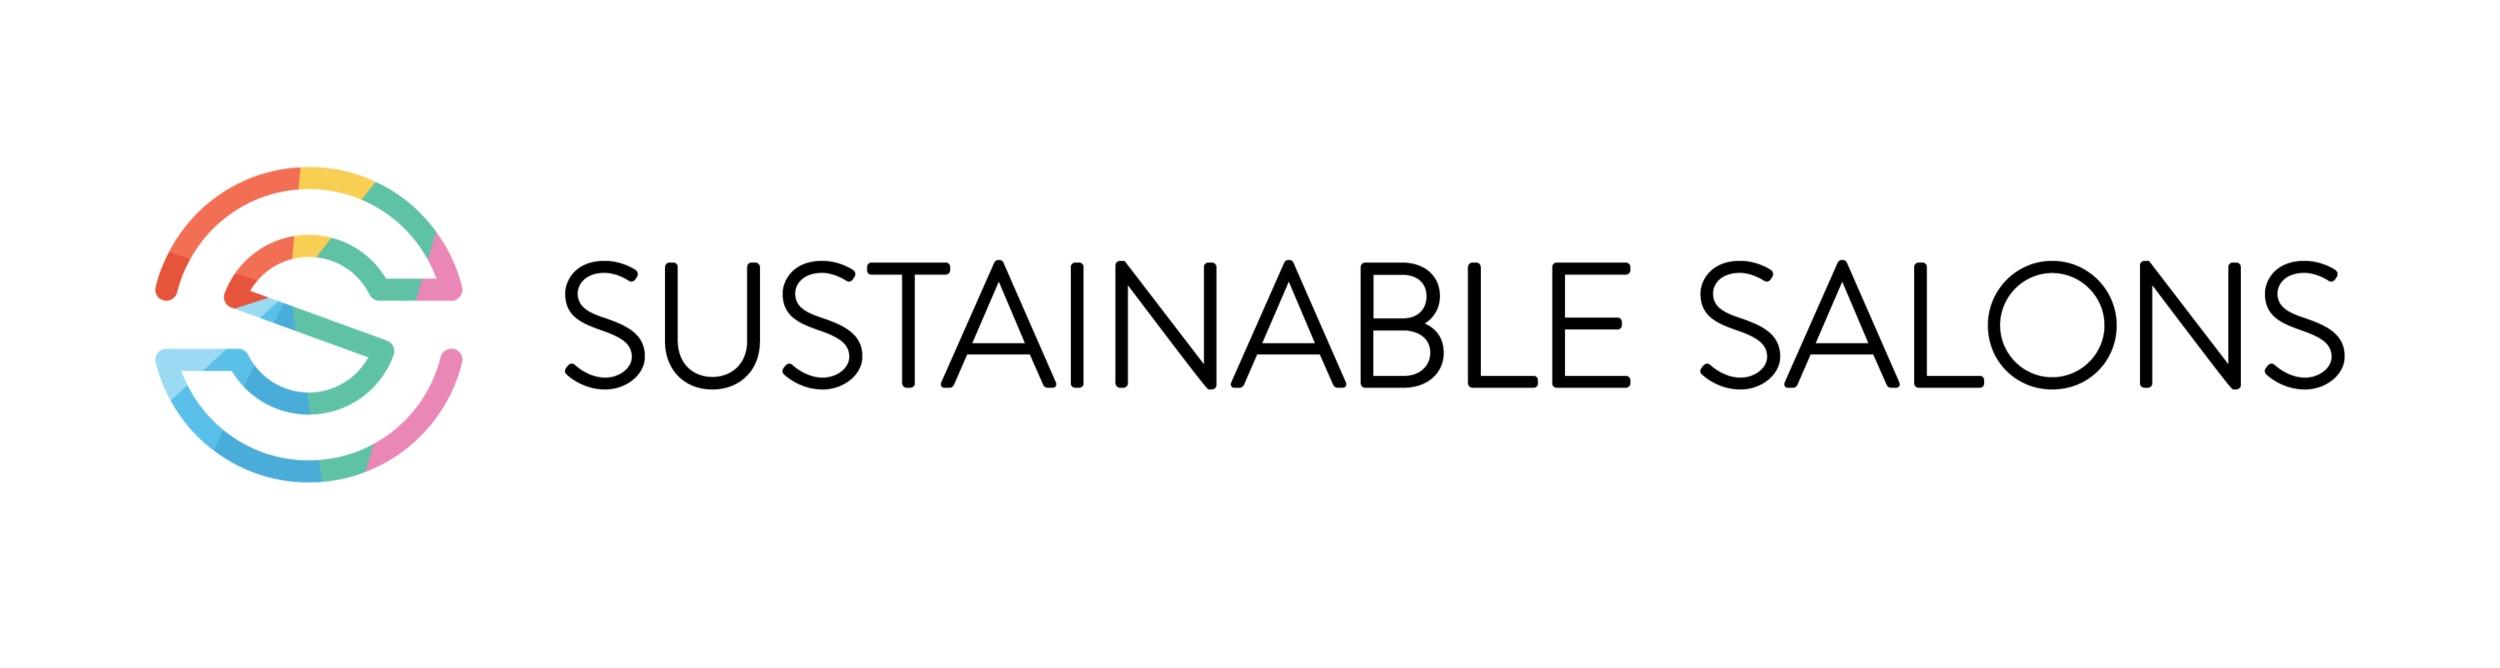 Sustainable+Salons+Logo_Horizontal_Colour_Digital.jpg